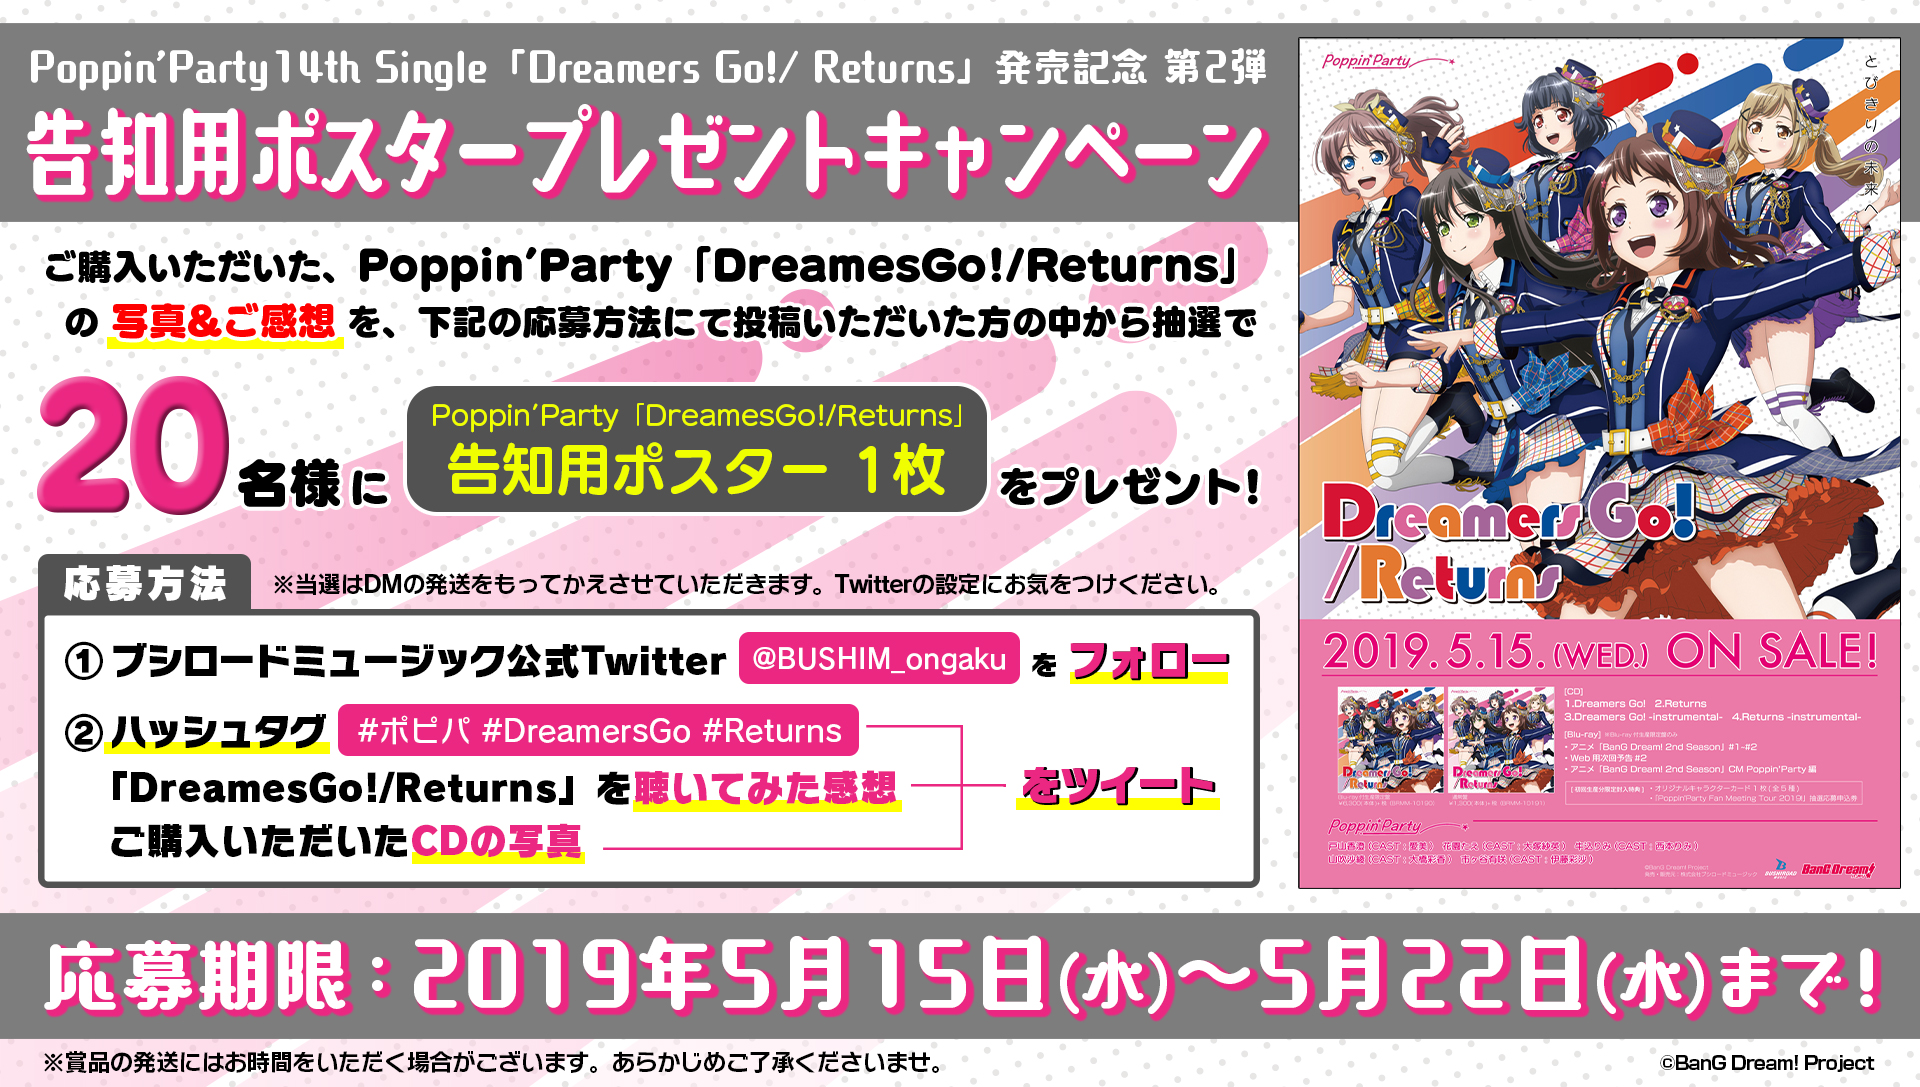 BanG Dream!(バンドリ!)Poppin'Party14th Single「Dreamers Go!/ Returns」発売記念 第2弾 告知用ポスタープレゼントキャンペーン